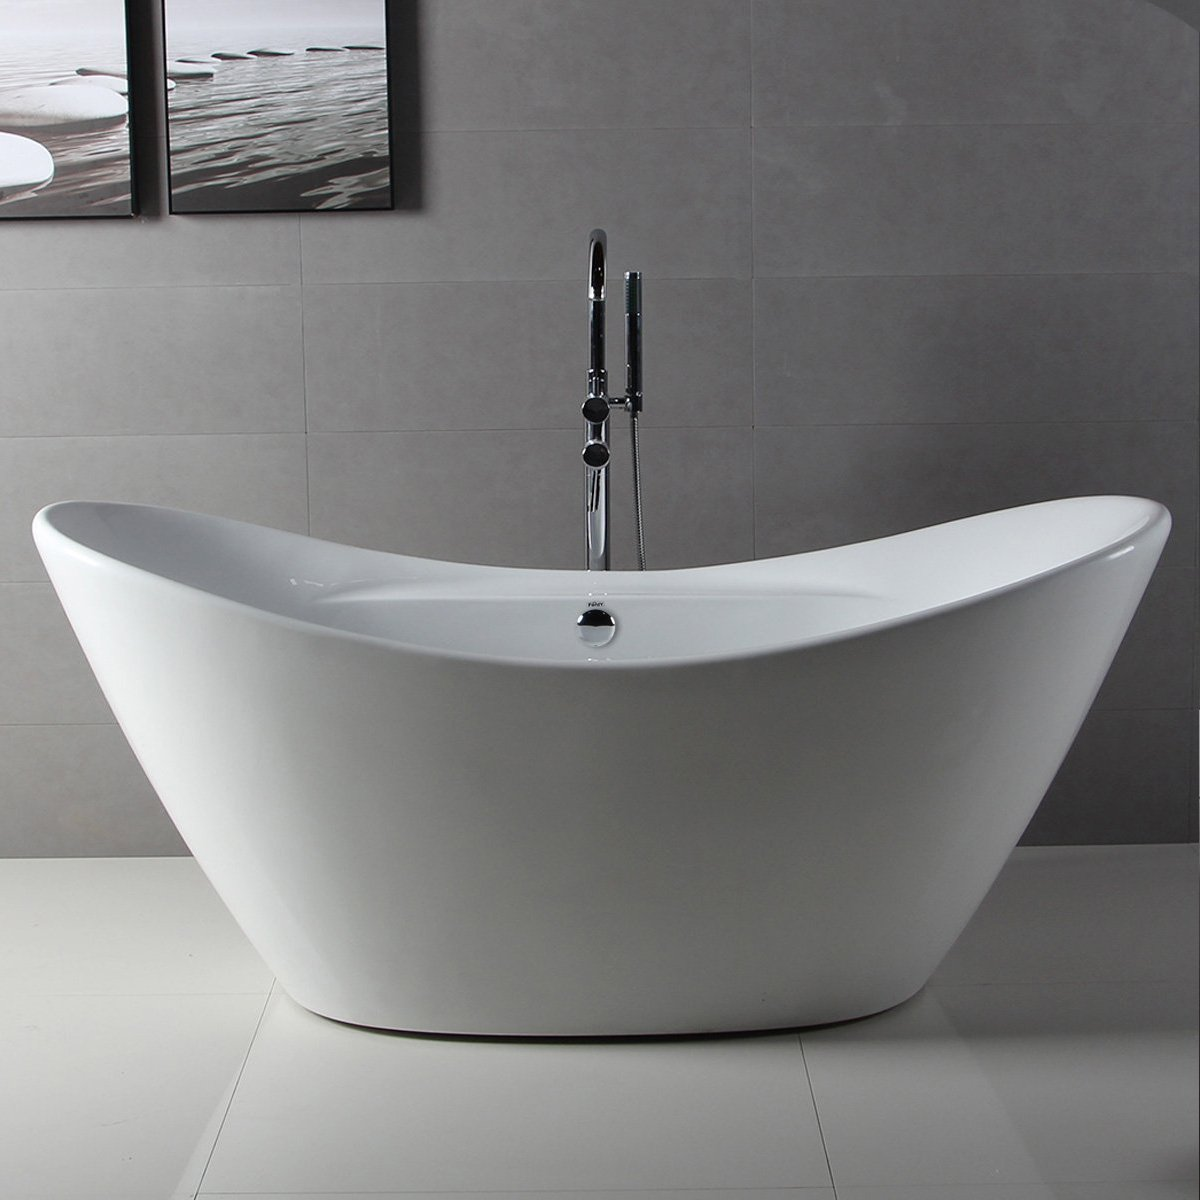 FerdY 68\'\' Acrylic Stand Alone Bathtub, White Modern Freestanding ...